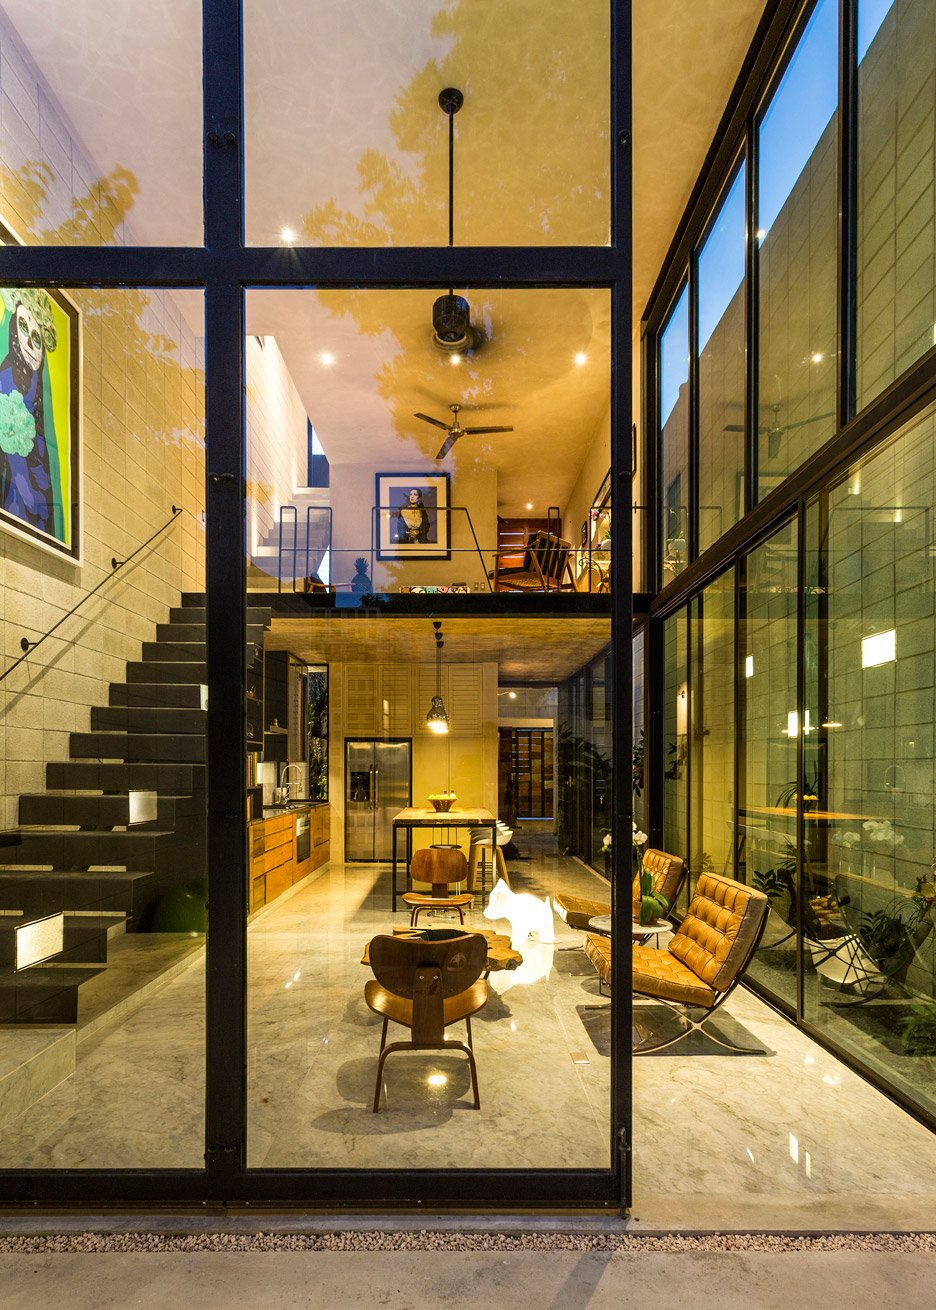 Raw Casa pelo Studio Estilo em Yucatán, México